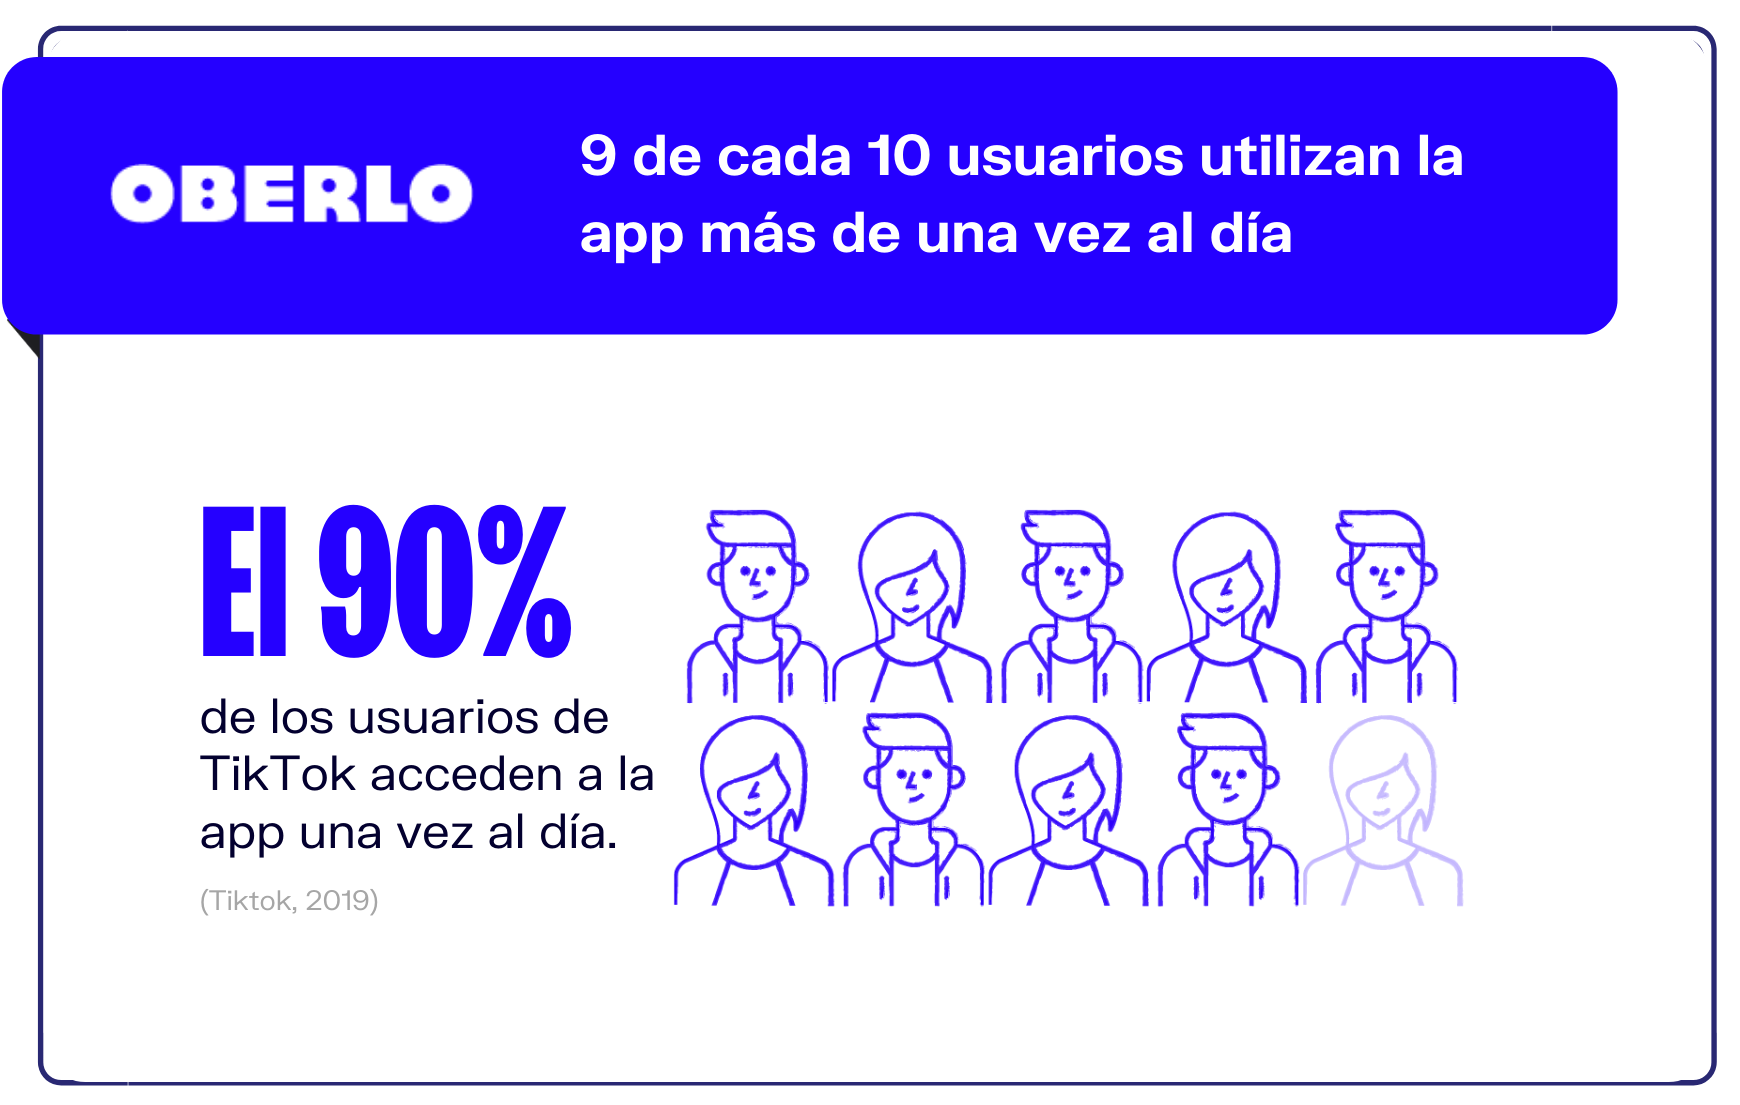 8-9-de-cada-10-usuarios-usan-TikTok-varias-veces-al-dia